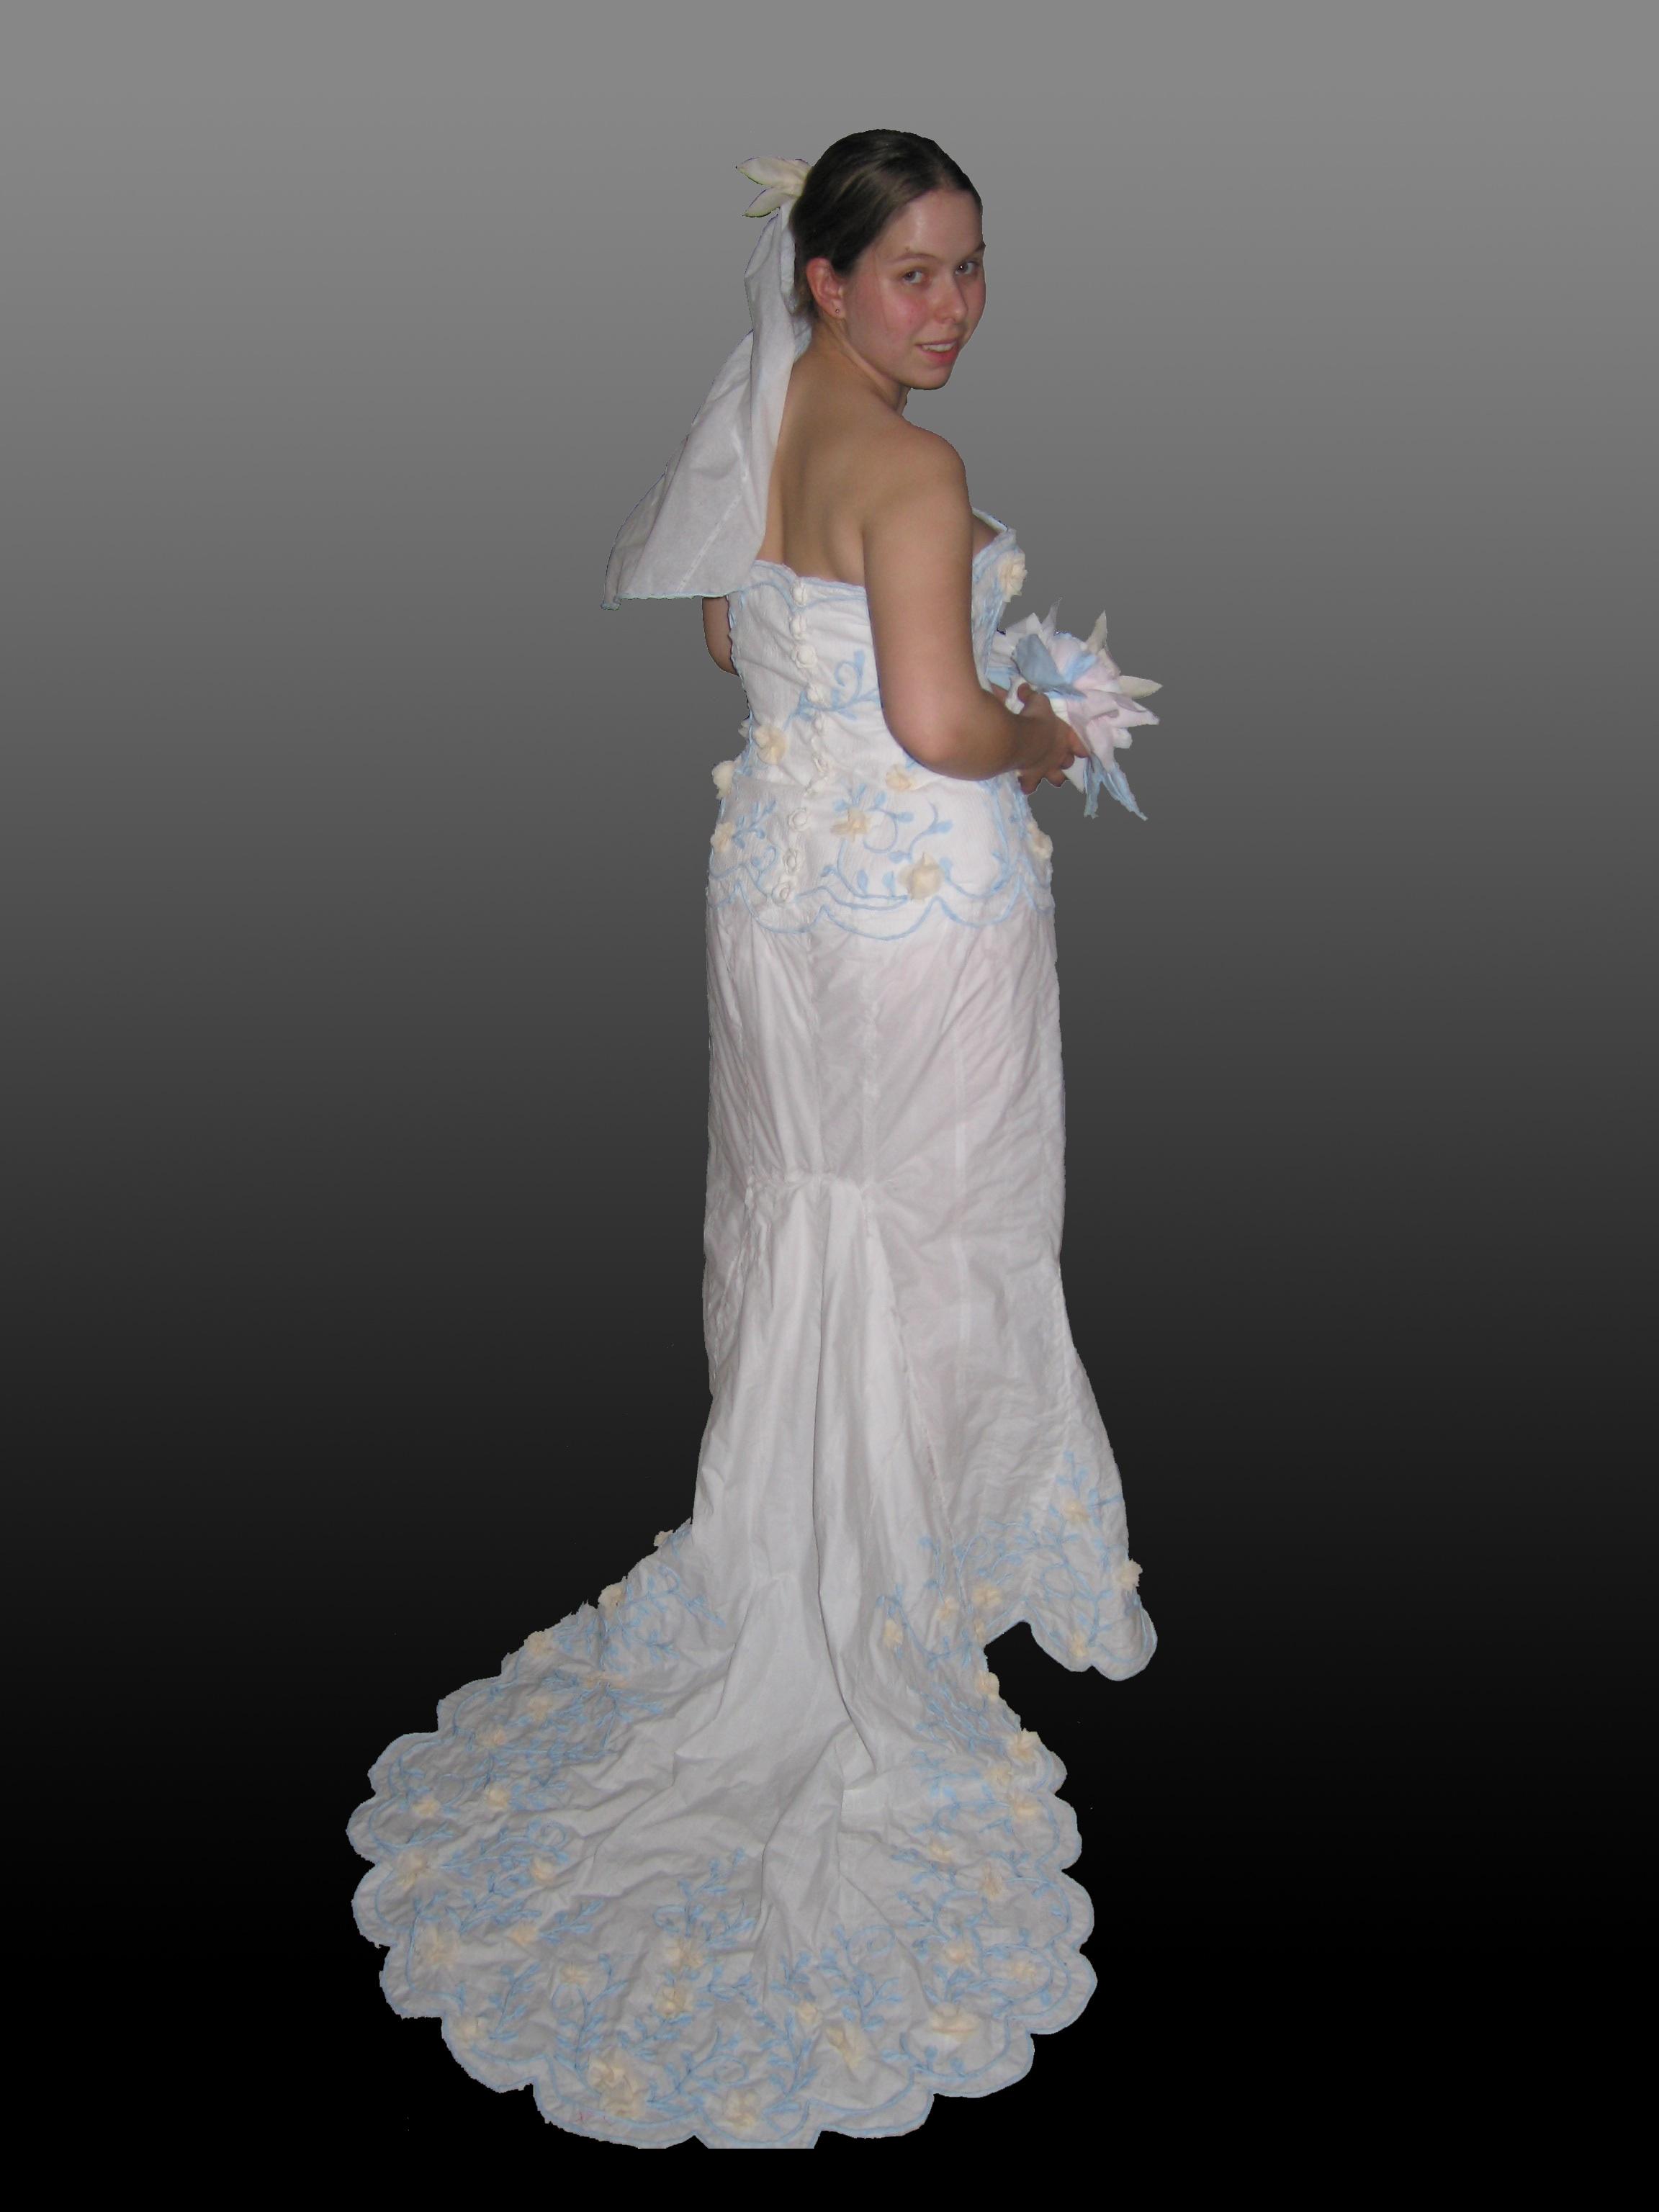 The 2005 Toilet Paper Wedding Dress Contest